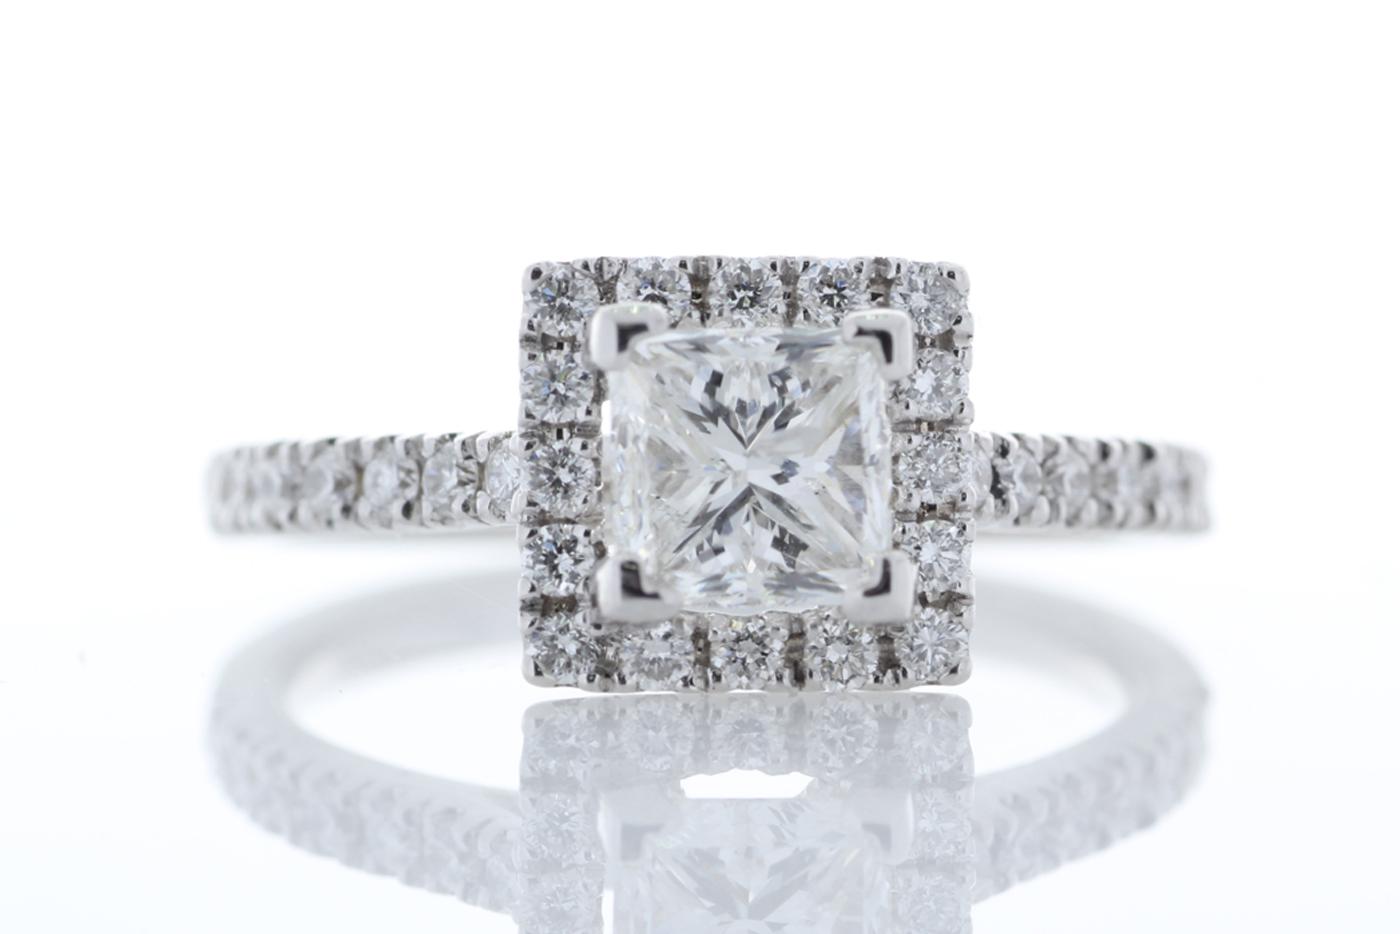 18ct White Gold Halo Set Princess Cut Diamond Ring 1.36 Carats